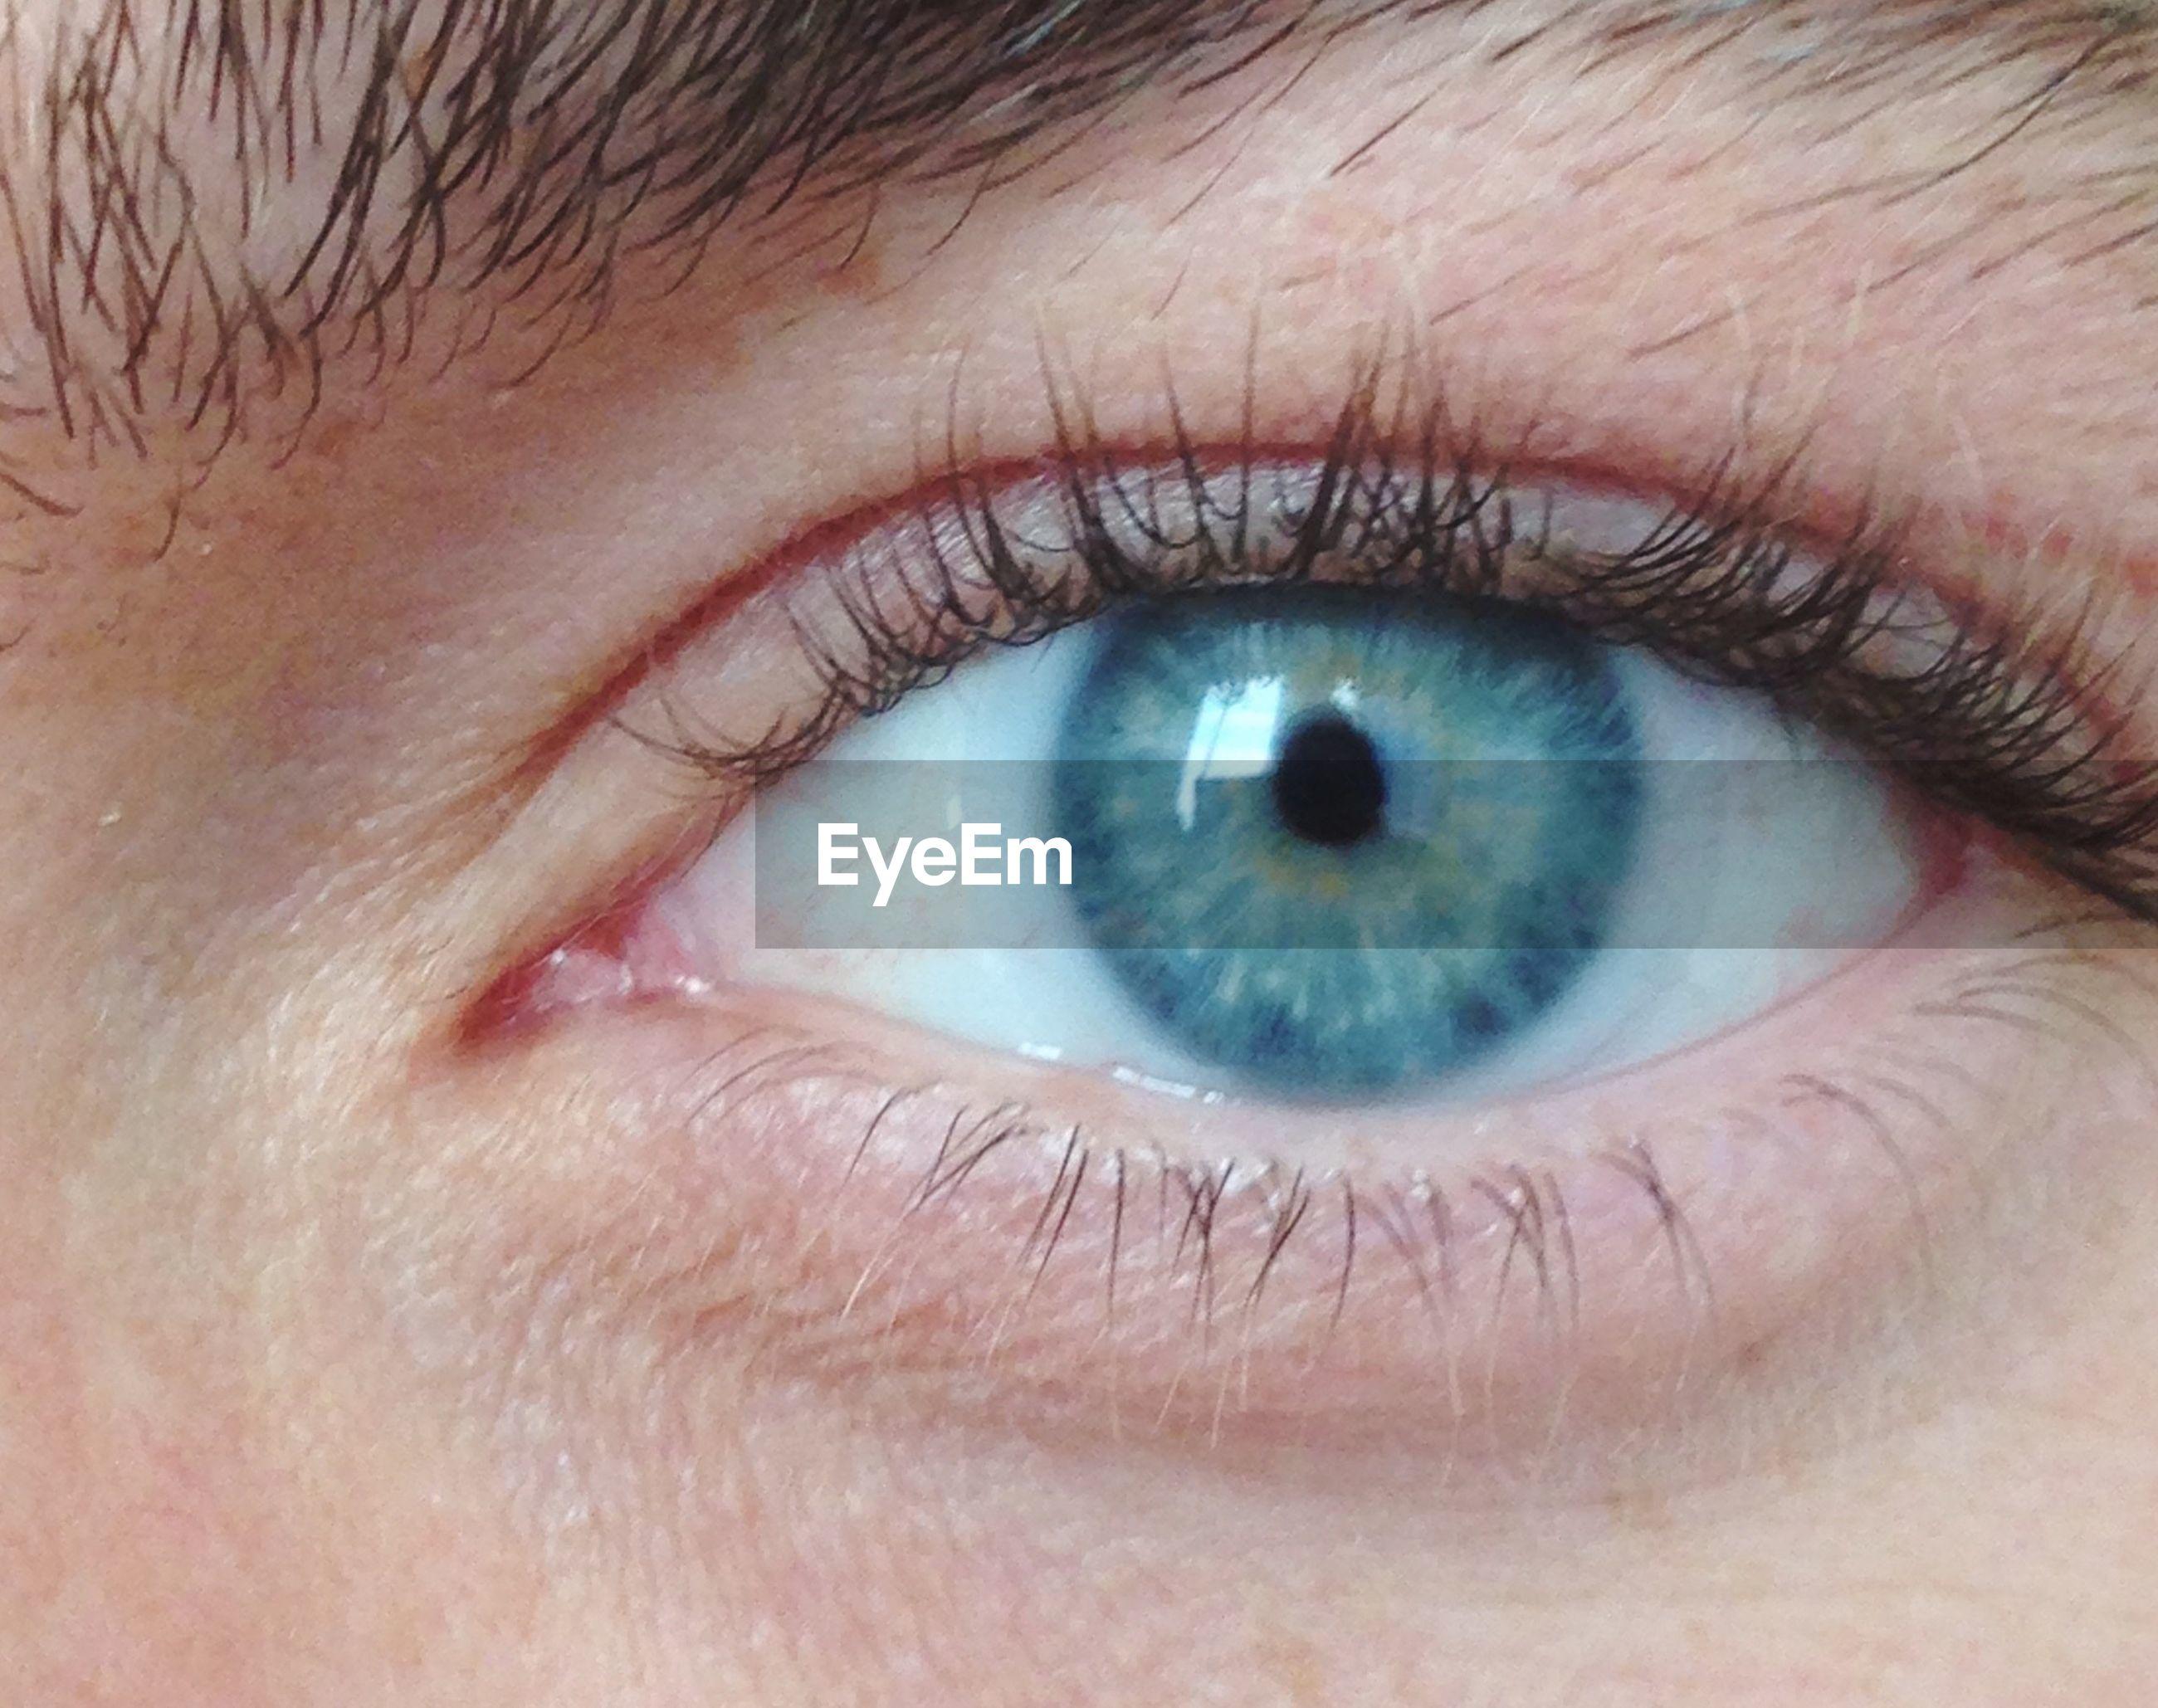 human eye, eyelash, eyesight, close-up, sensory perception, human skin, iris - eye, part of, eyeball, extreme close-up, looking at camera, eyebrow, human face, portrait, lifestyles, extreme close up, vision